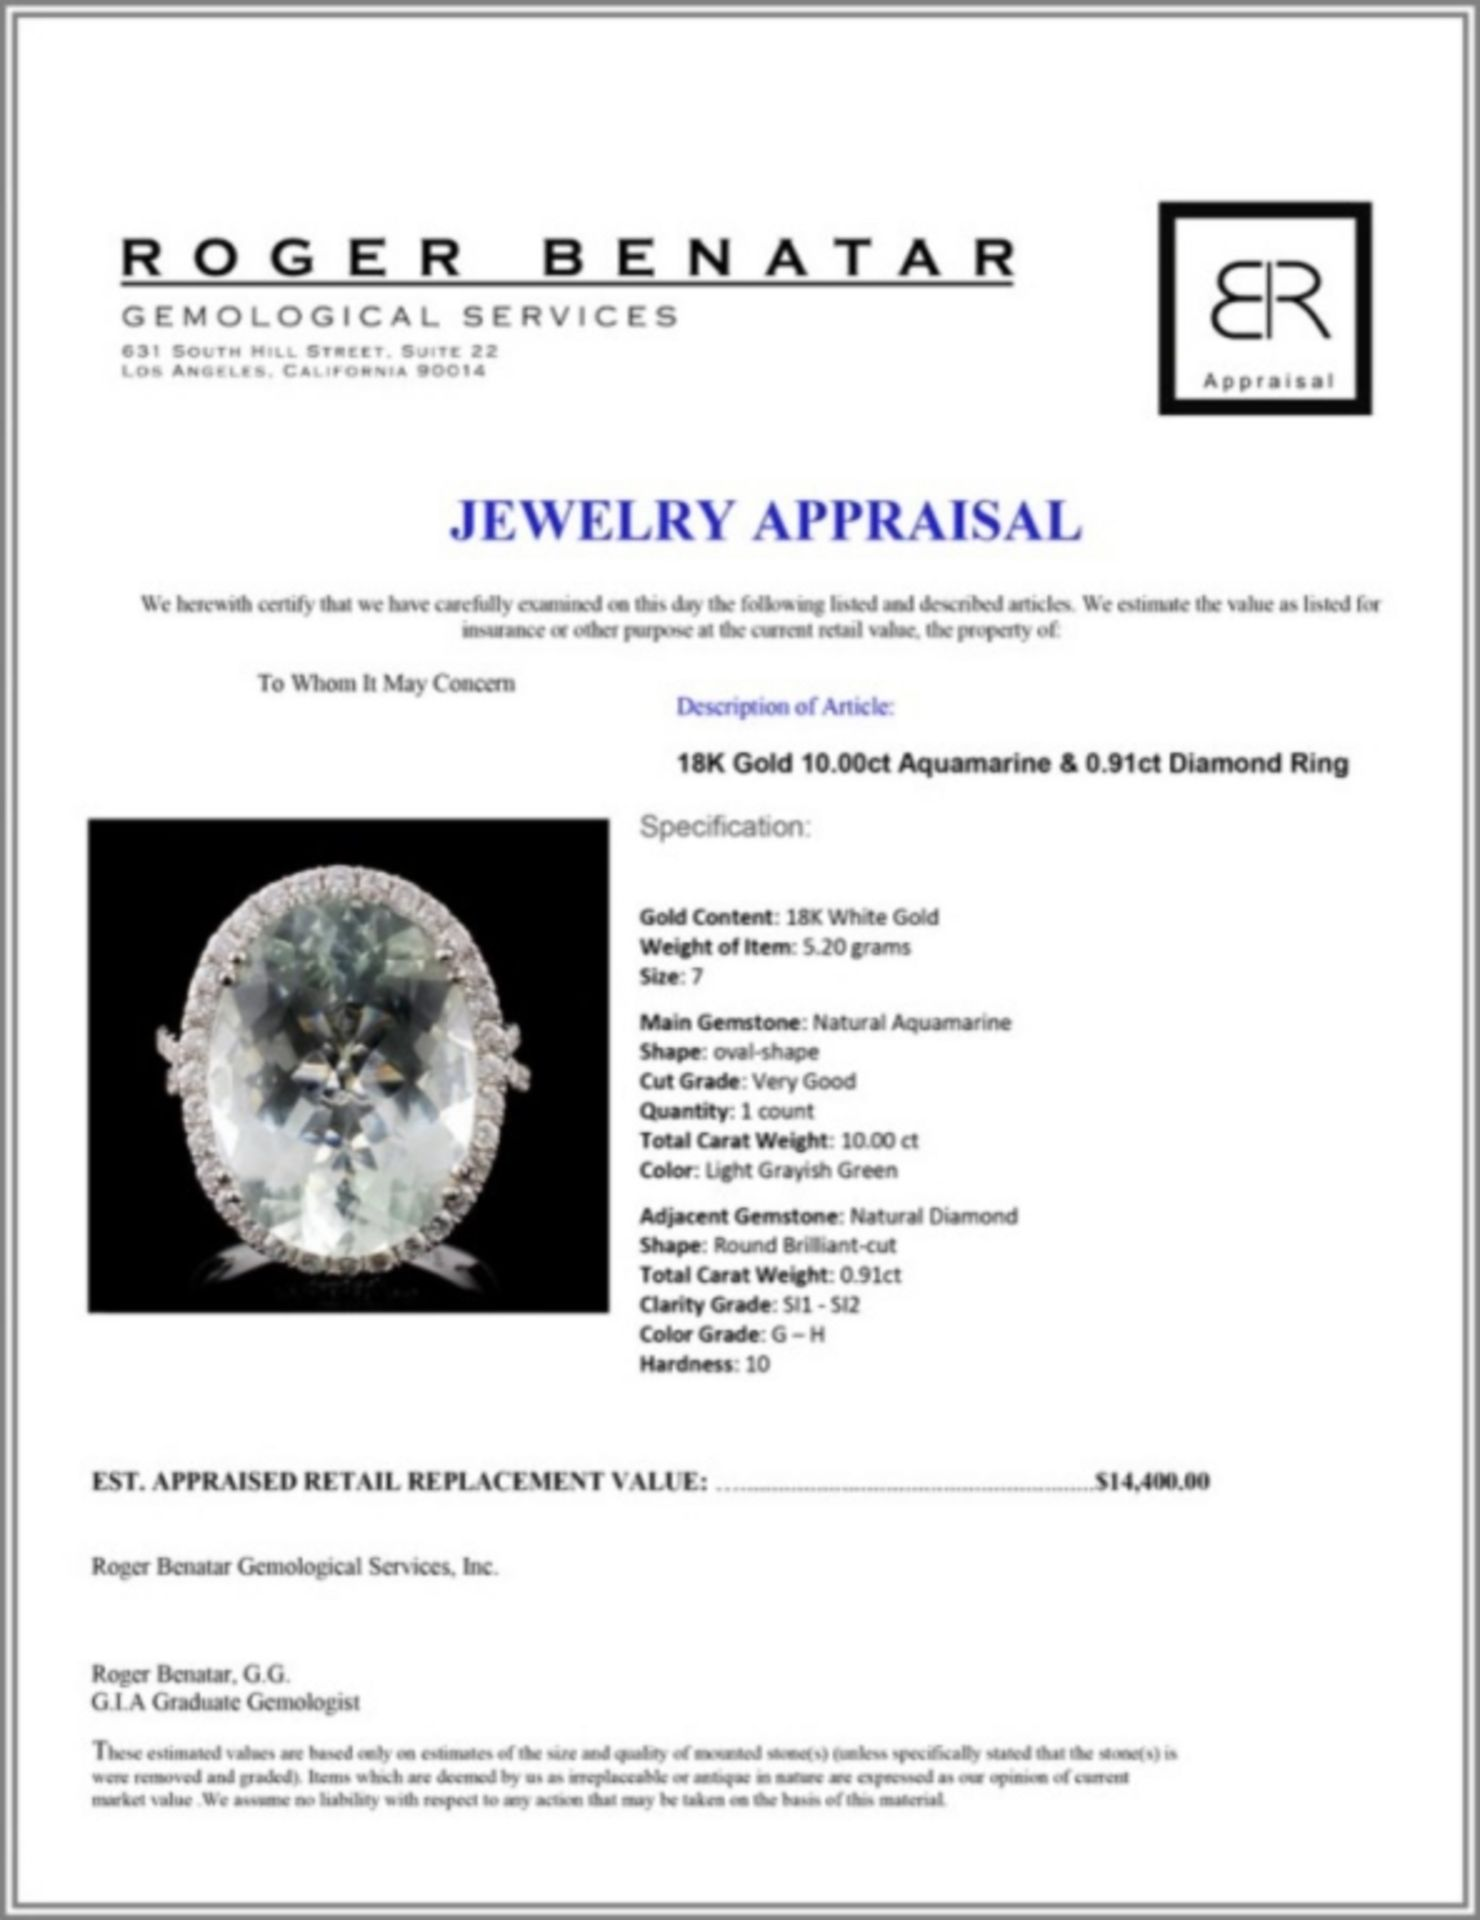 18K Gold 10.00ct Aquamarine & 0.91ct Diamond Ring - Image 4 of 4